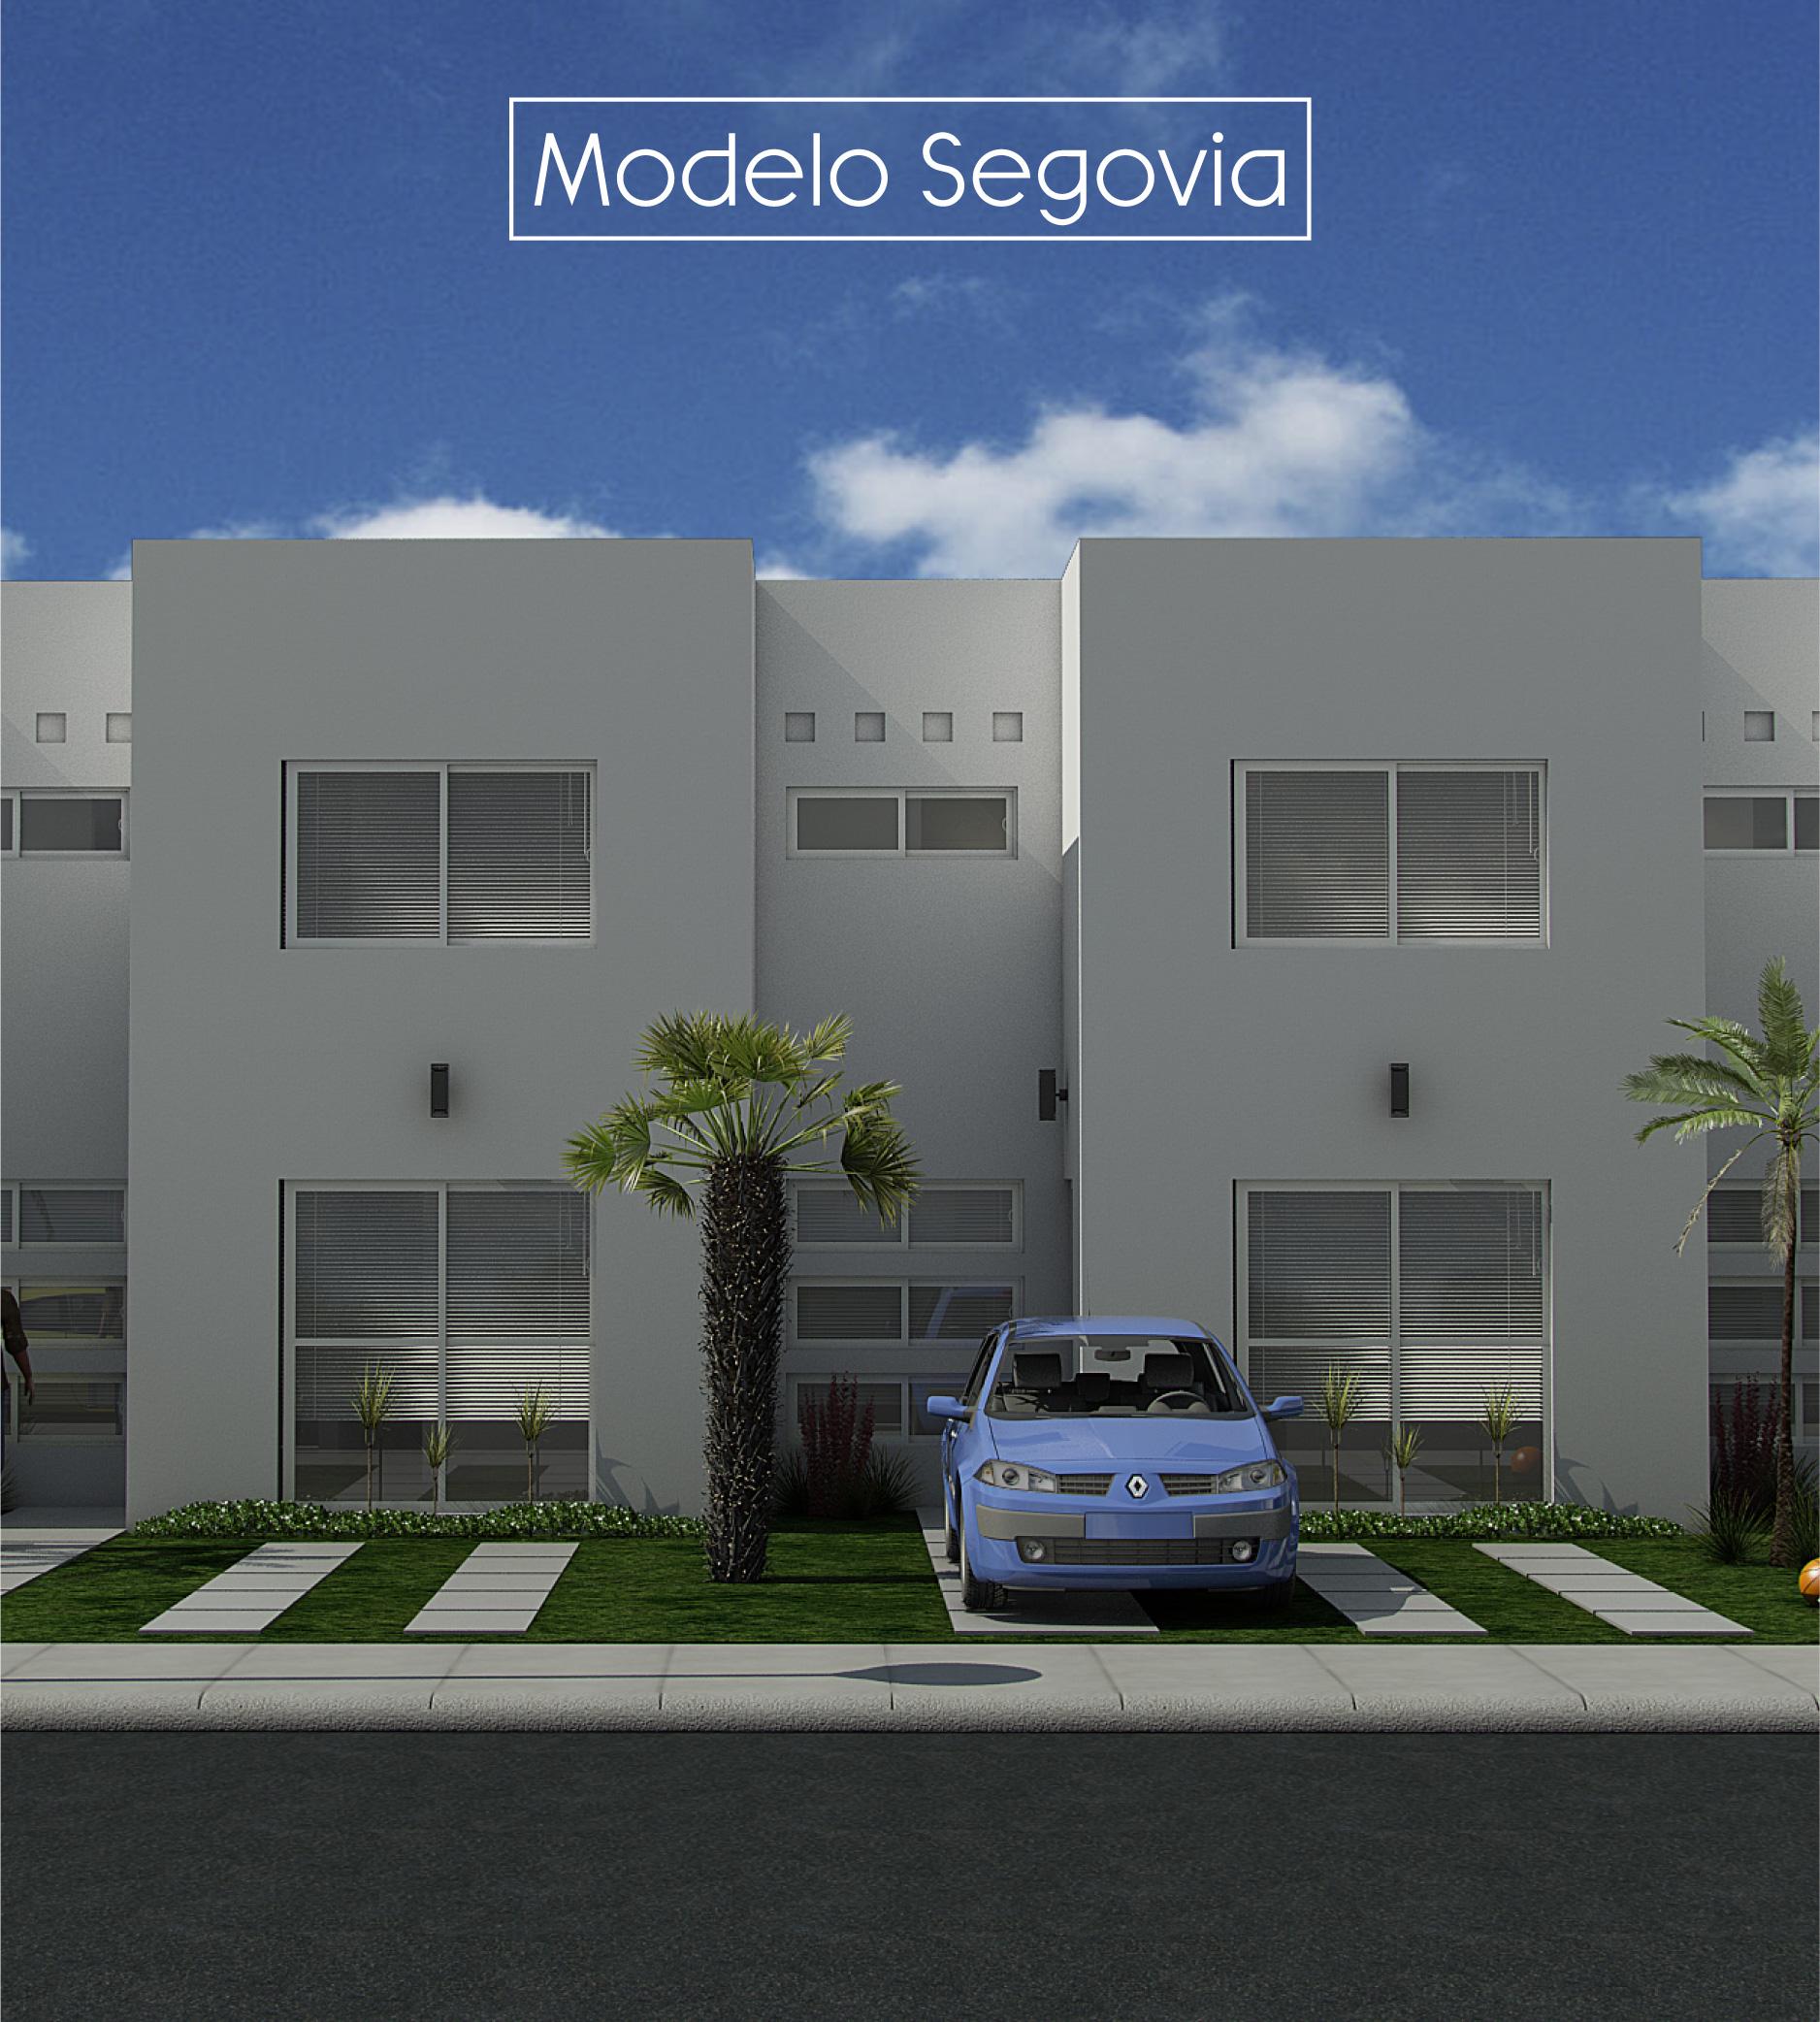 Modelo Segovia